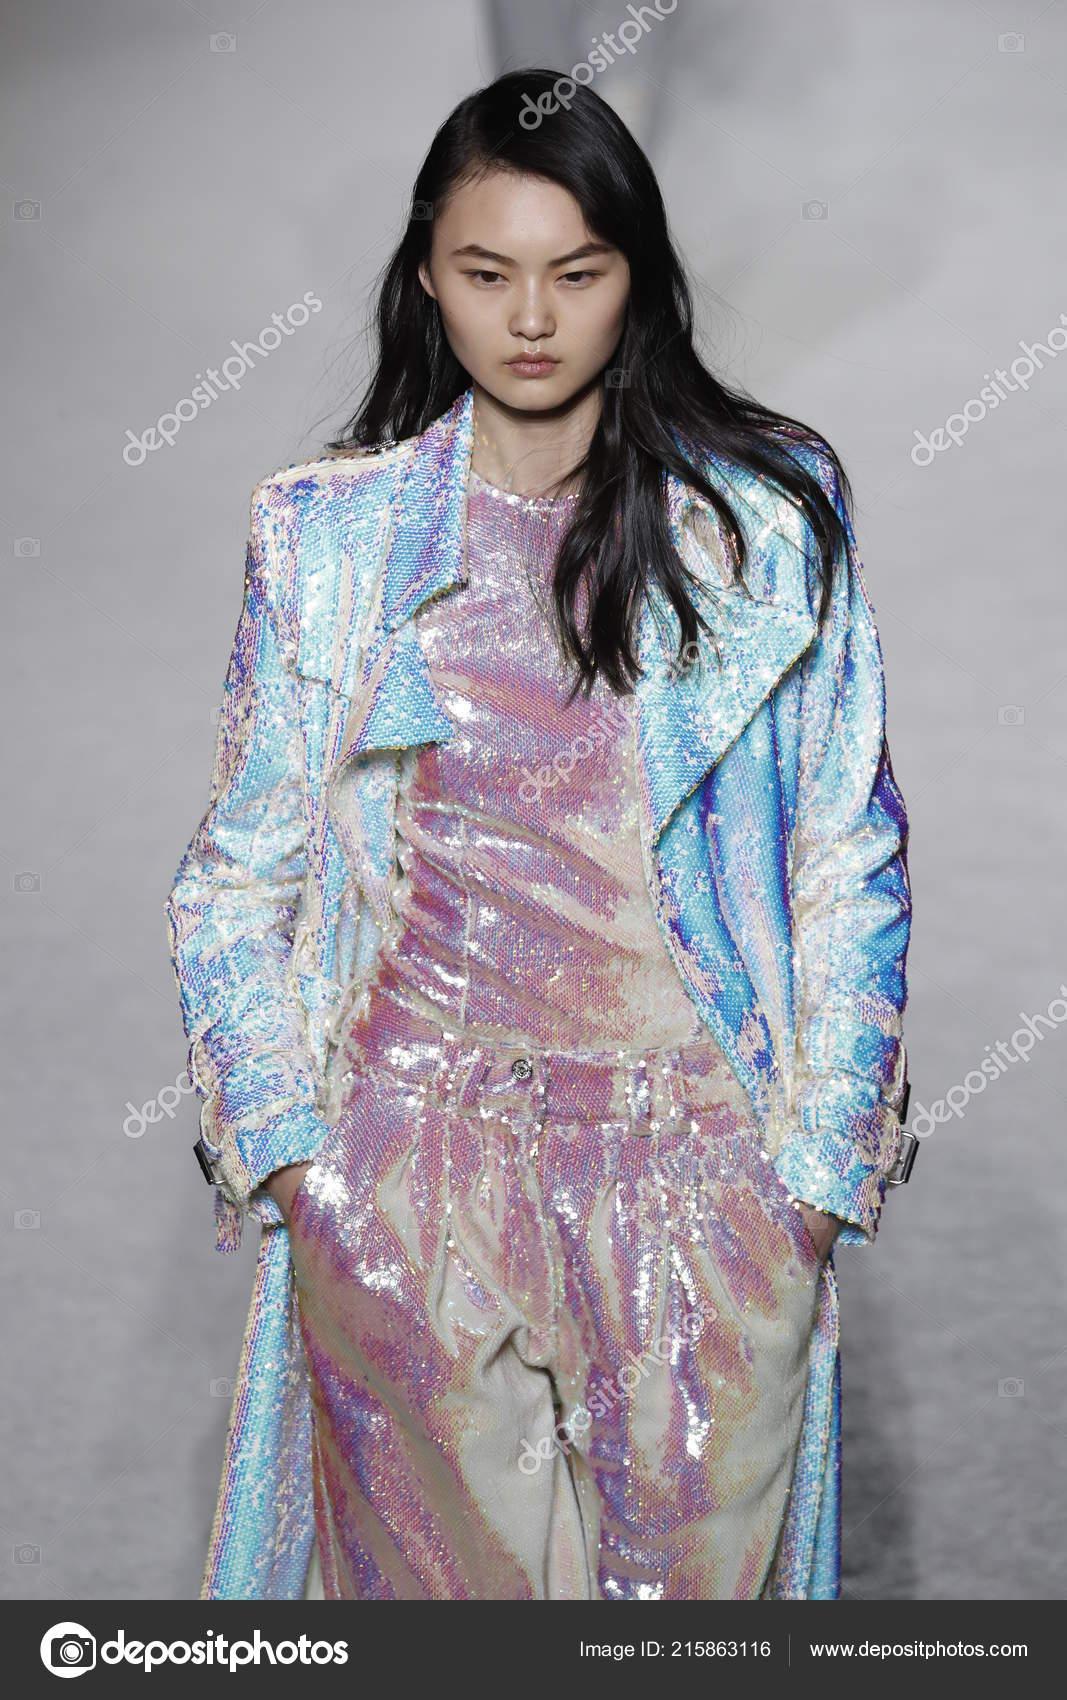 paris france march model walks runway balmain show part paris